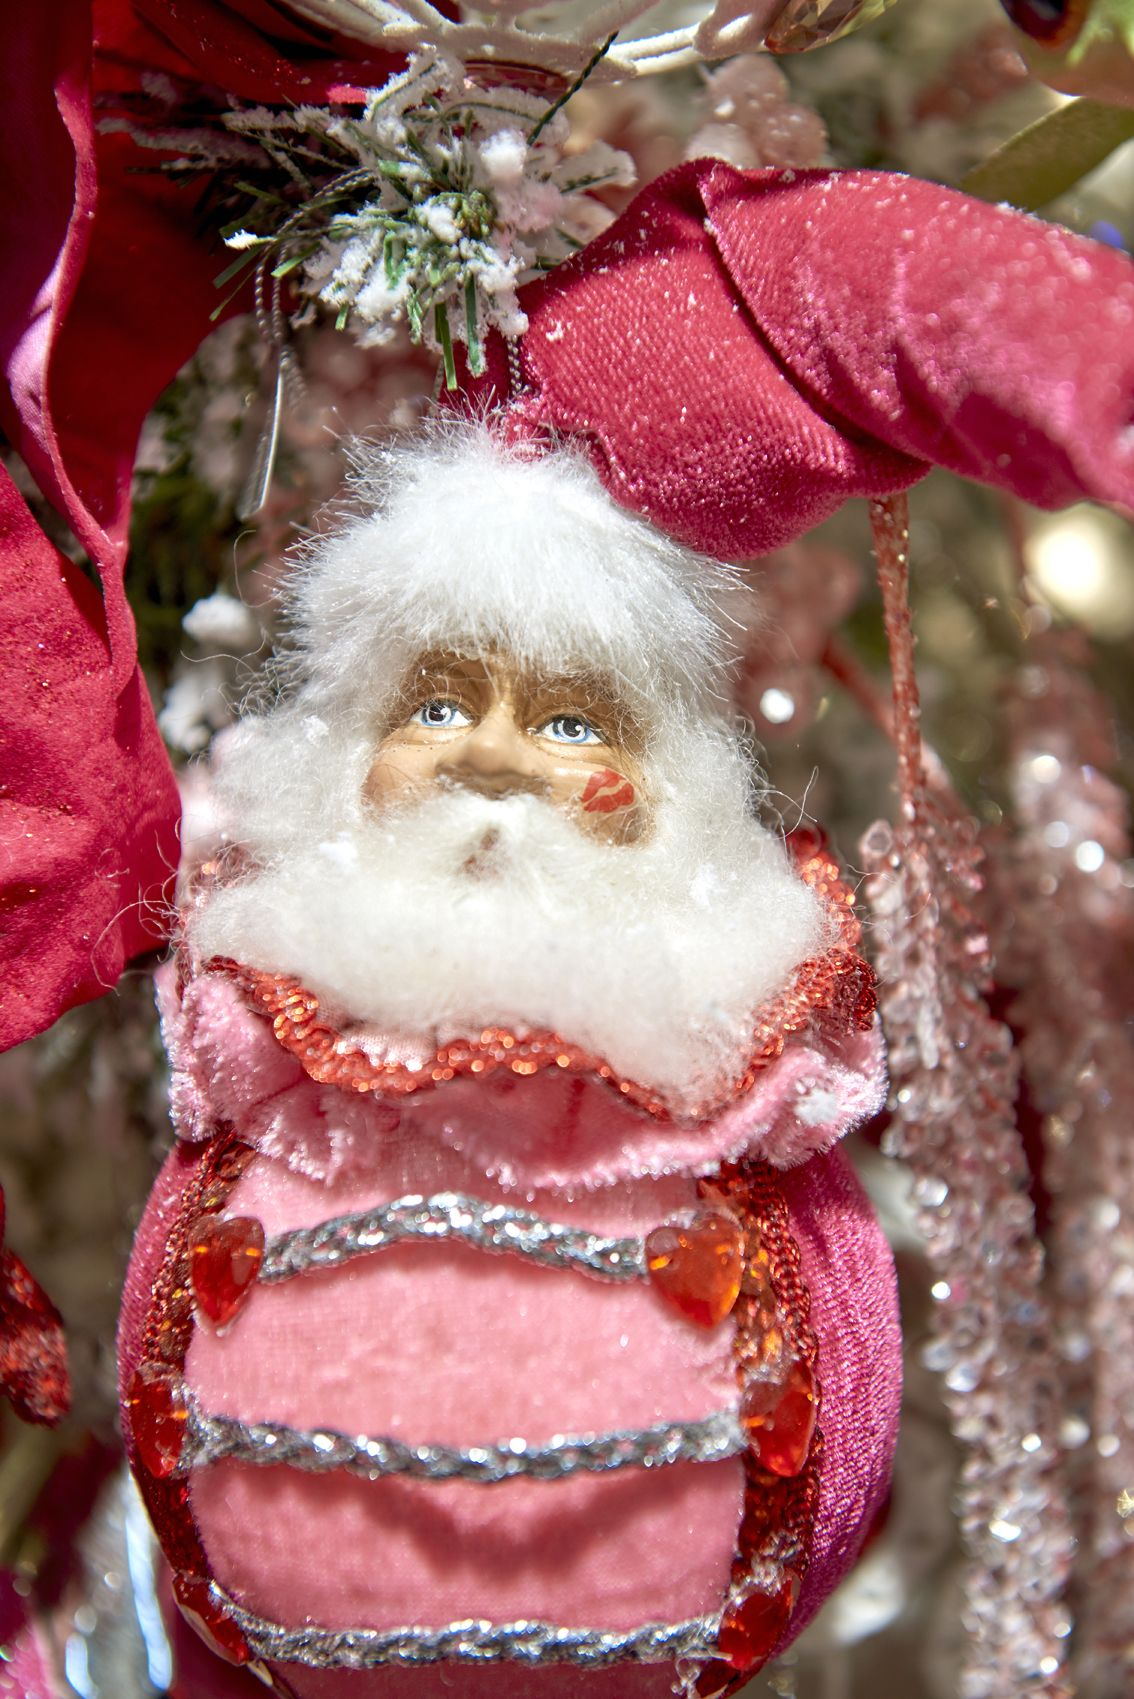 Merry Kissmas collection by Goodwill Belgium - Santa ball ornament pink